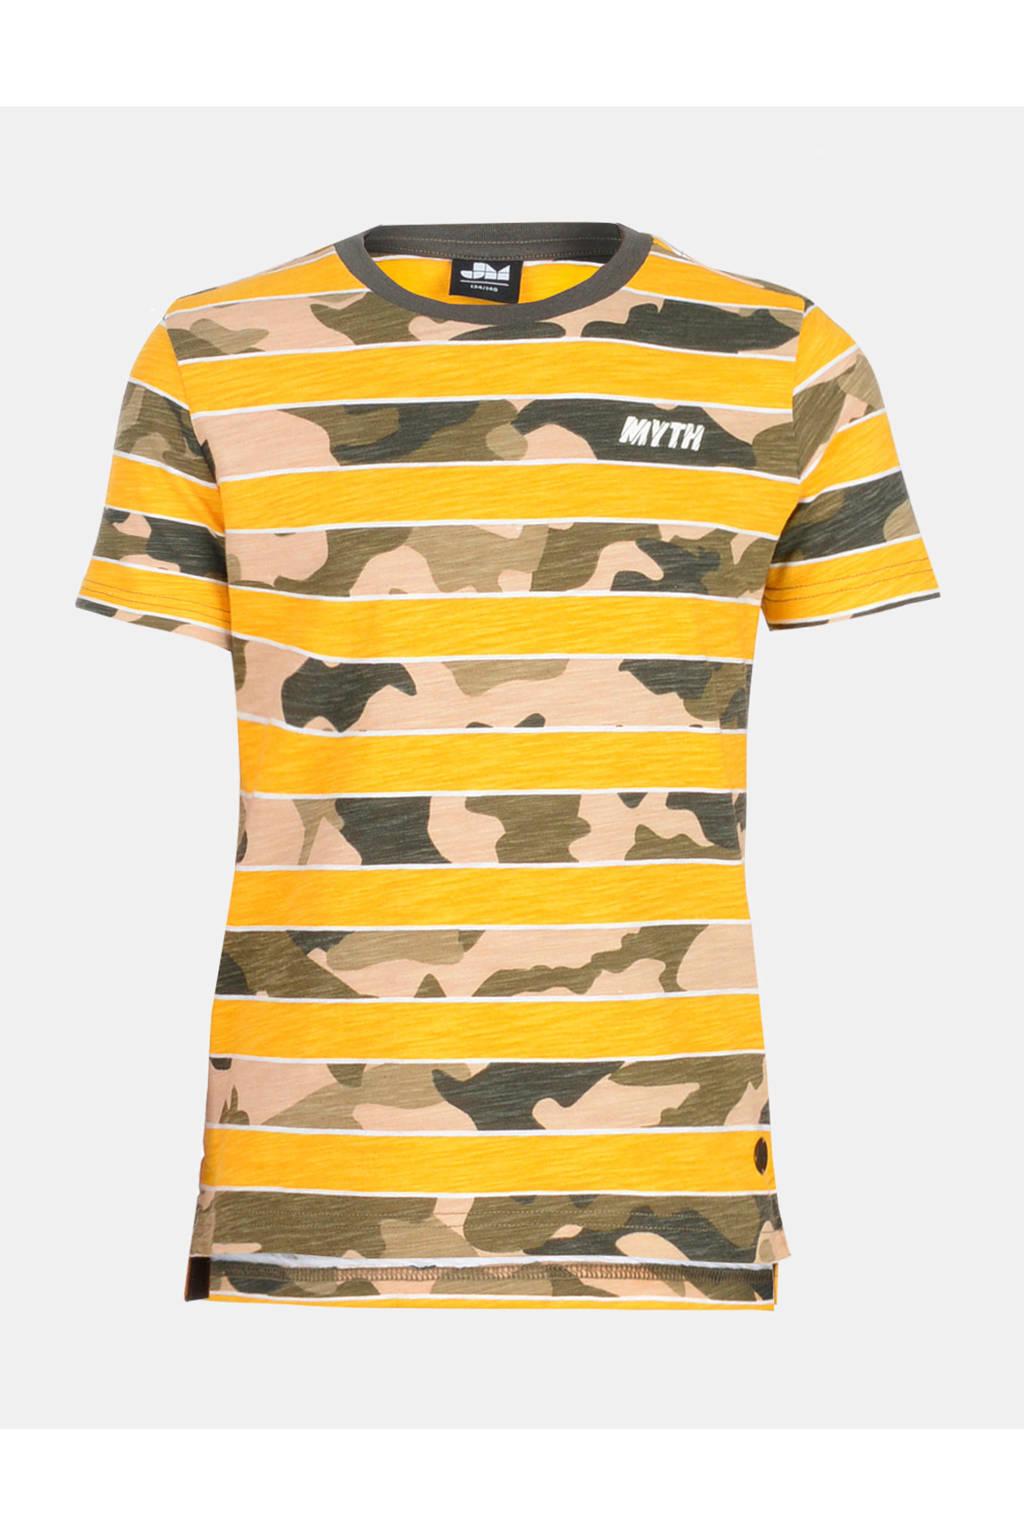 Mitch T-shirt Chess met camouflageprint geel, Geel